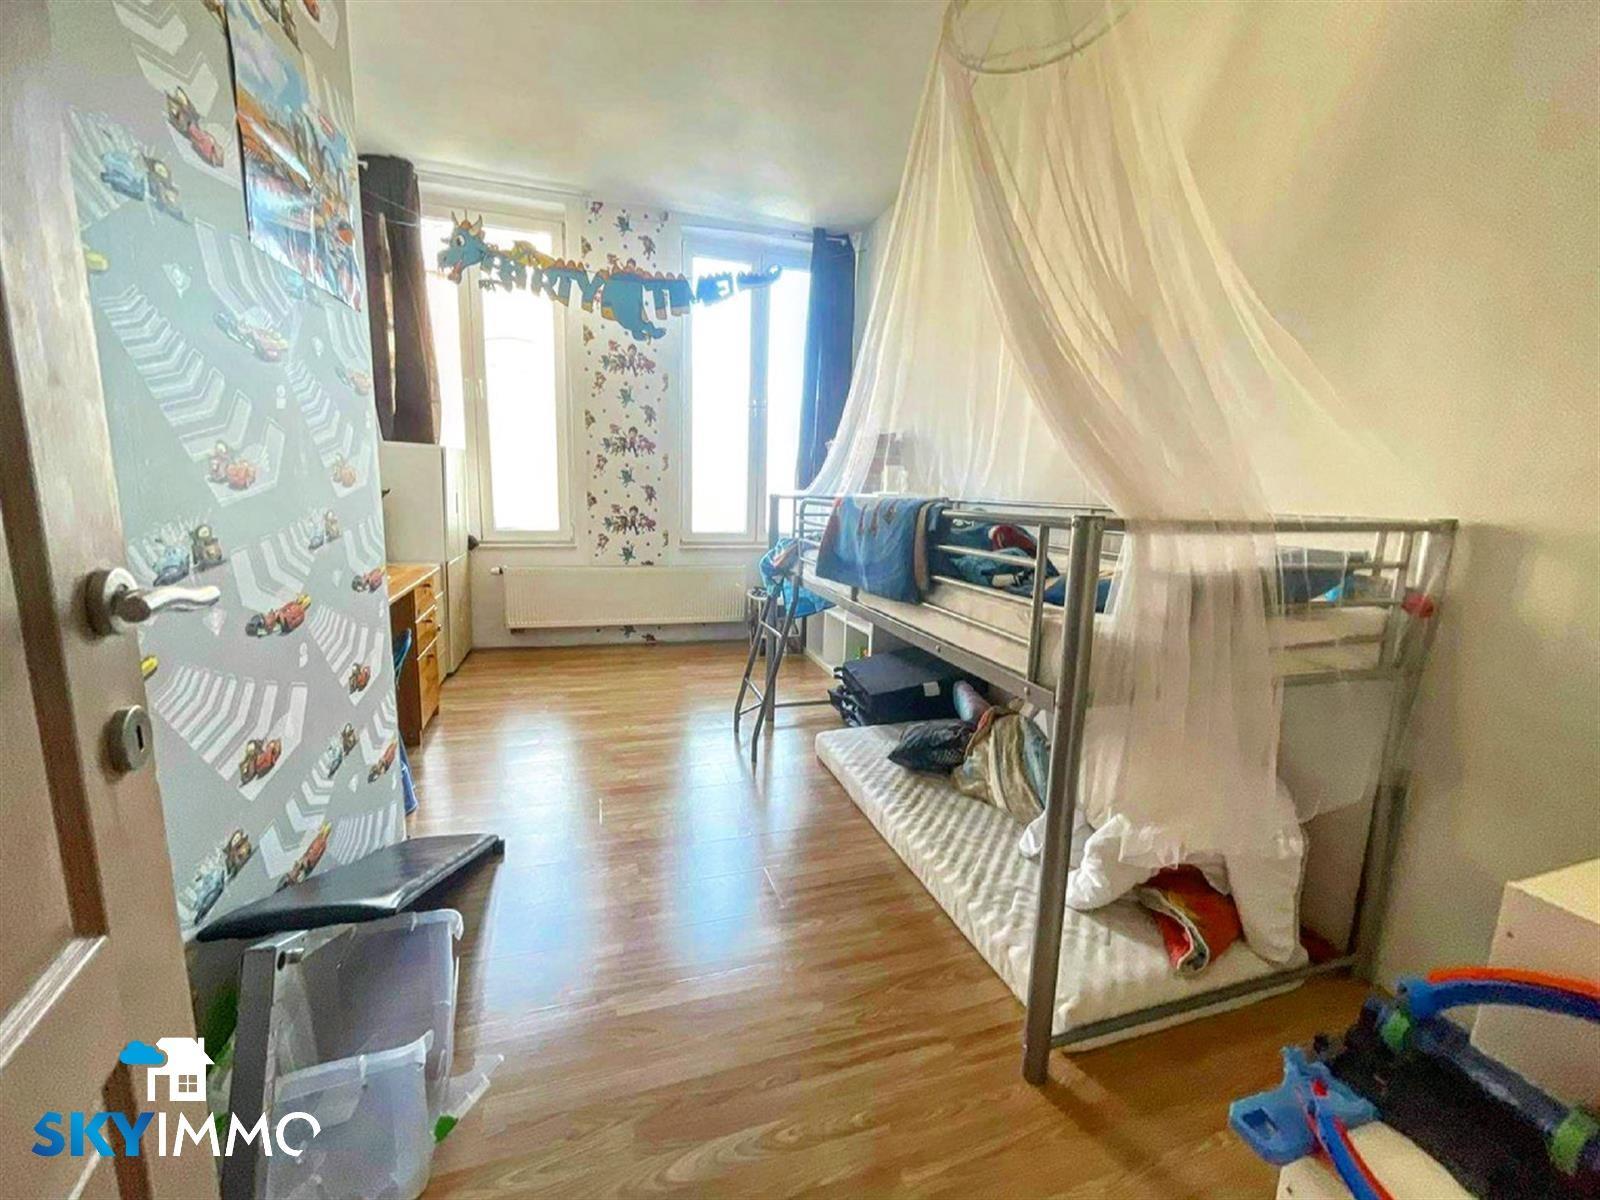 Maison - Seraing Jemeppesur-Meuse - #4343977-13